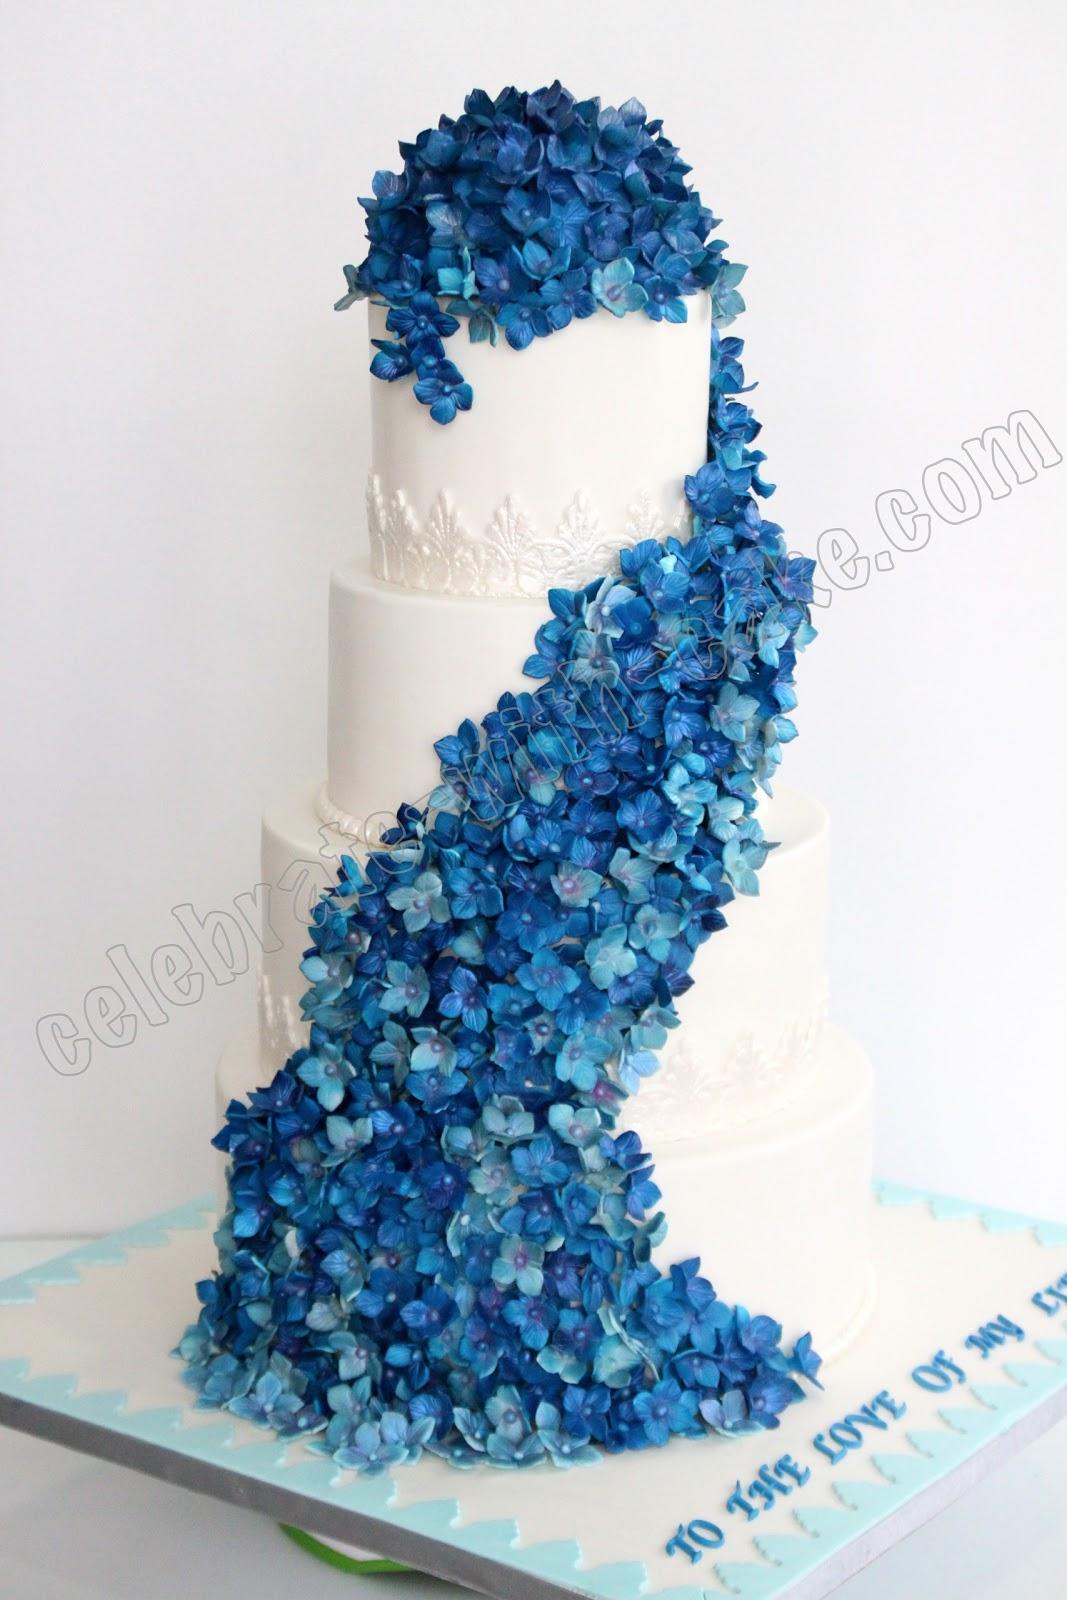 Celebrate with Cake Cascading Blue Hydrangeas Wedding Cake